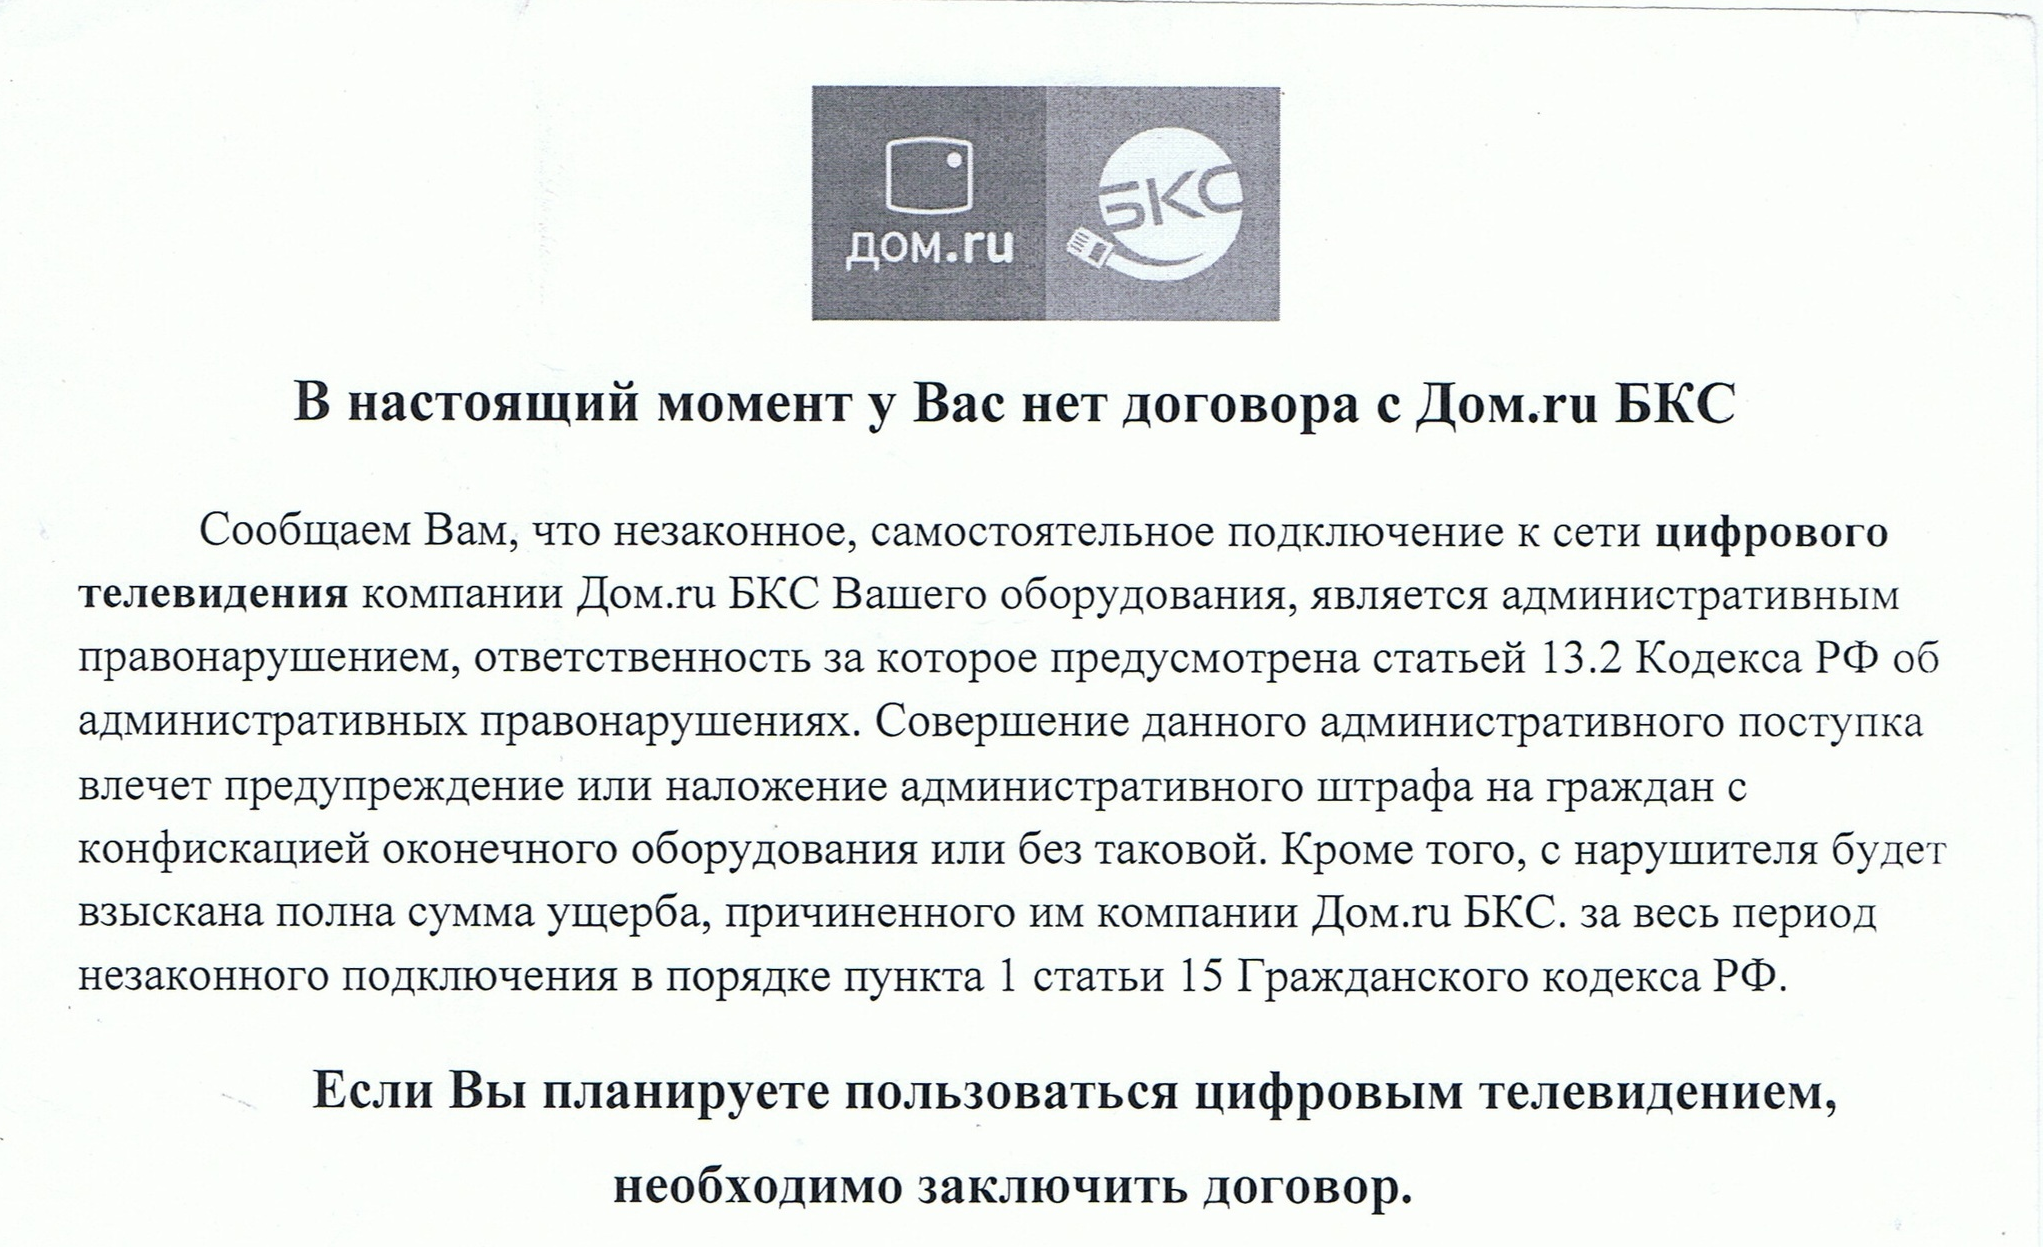 Гоп-стоп маркетинг от Дом.ру